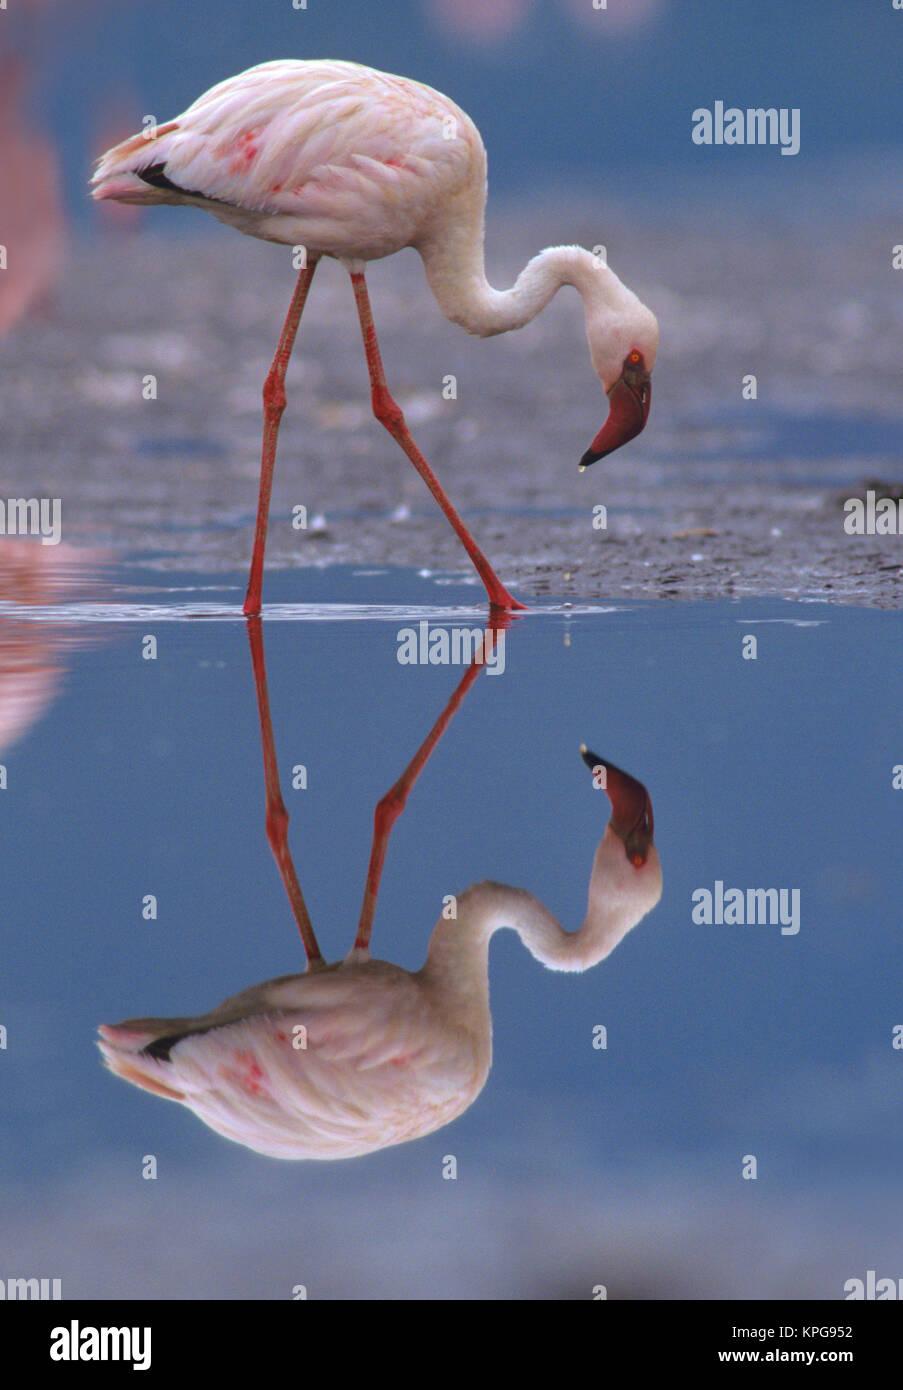 Lesser flamingo (Phoeniconaias minor) and its reflection, Kenya, Africa (Large format sizes available) - Stock Image